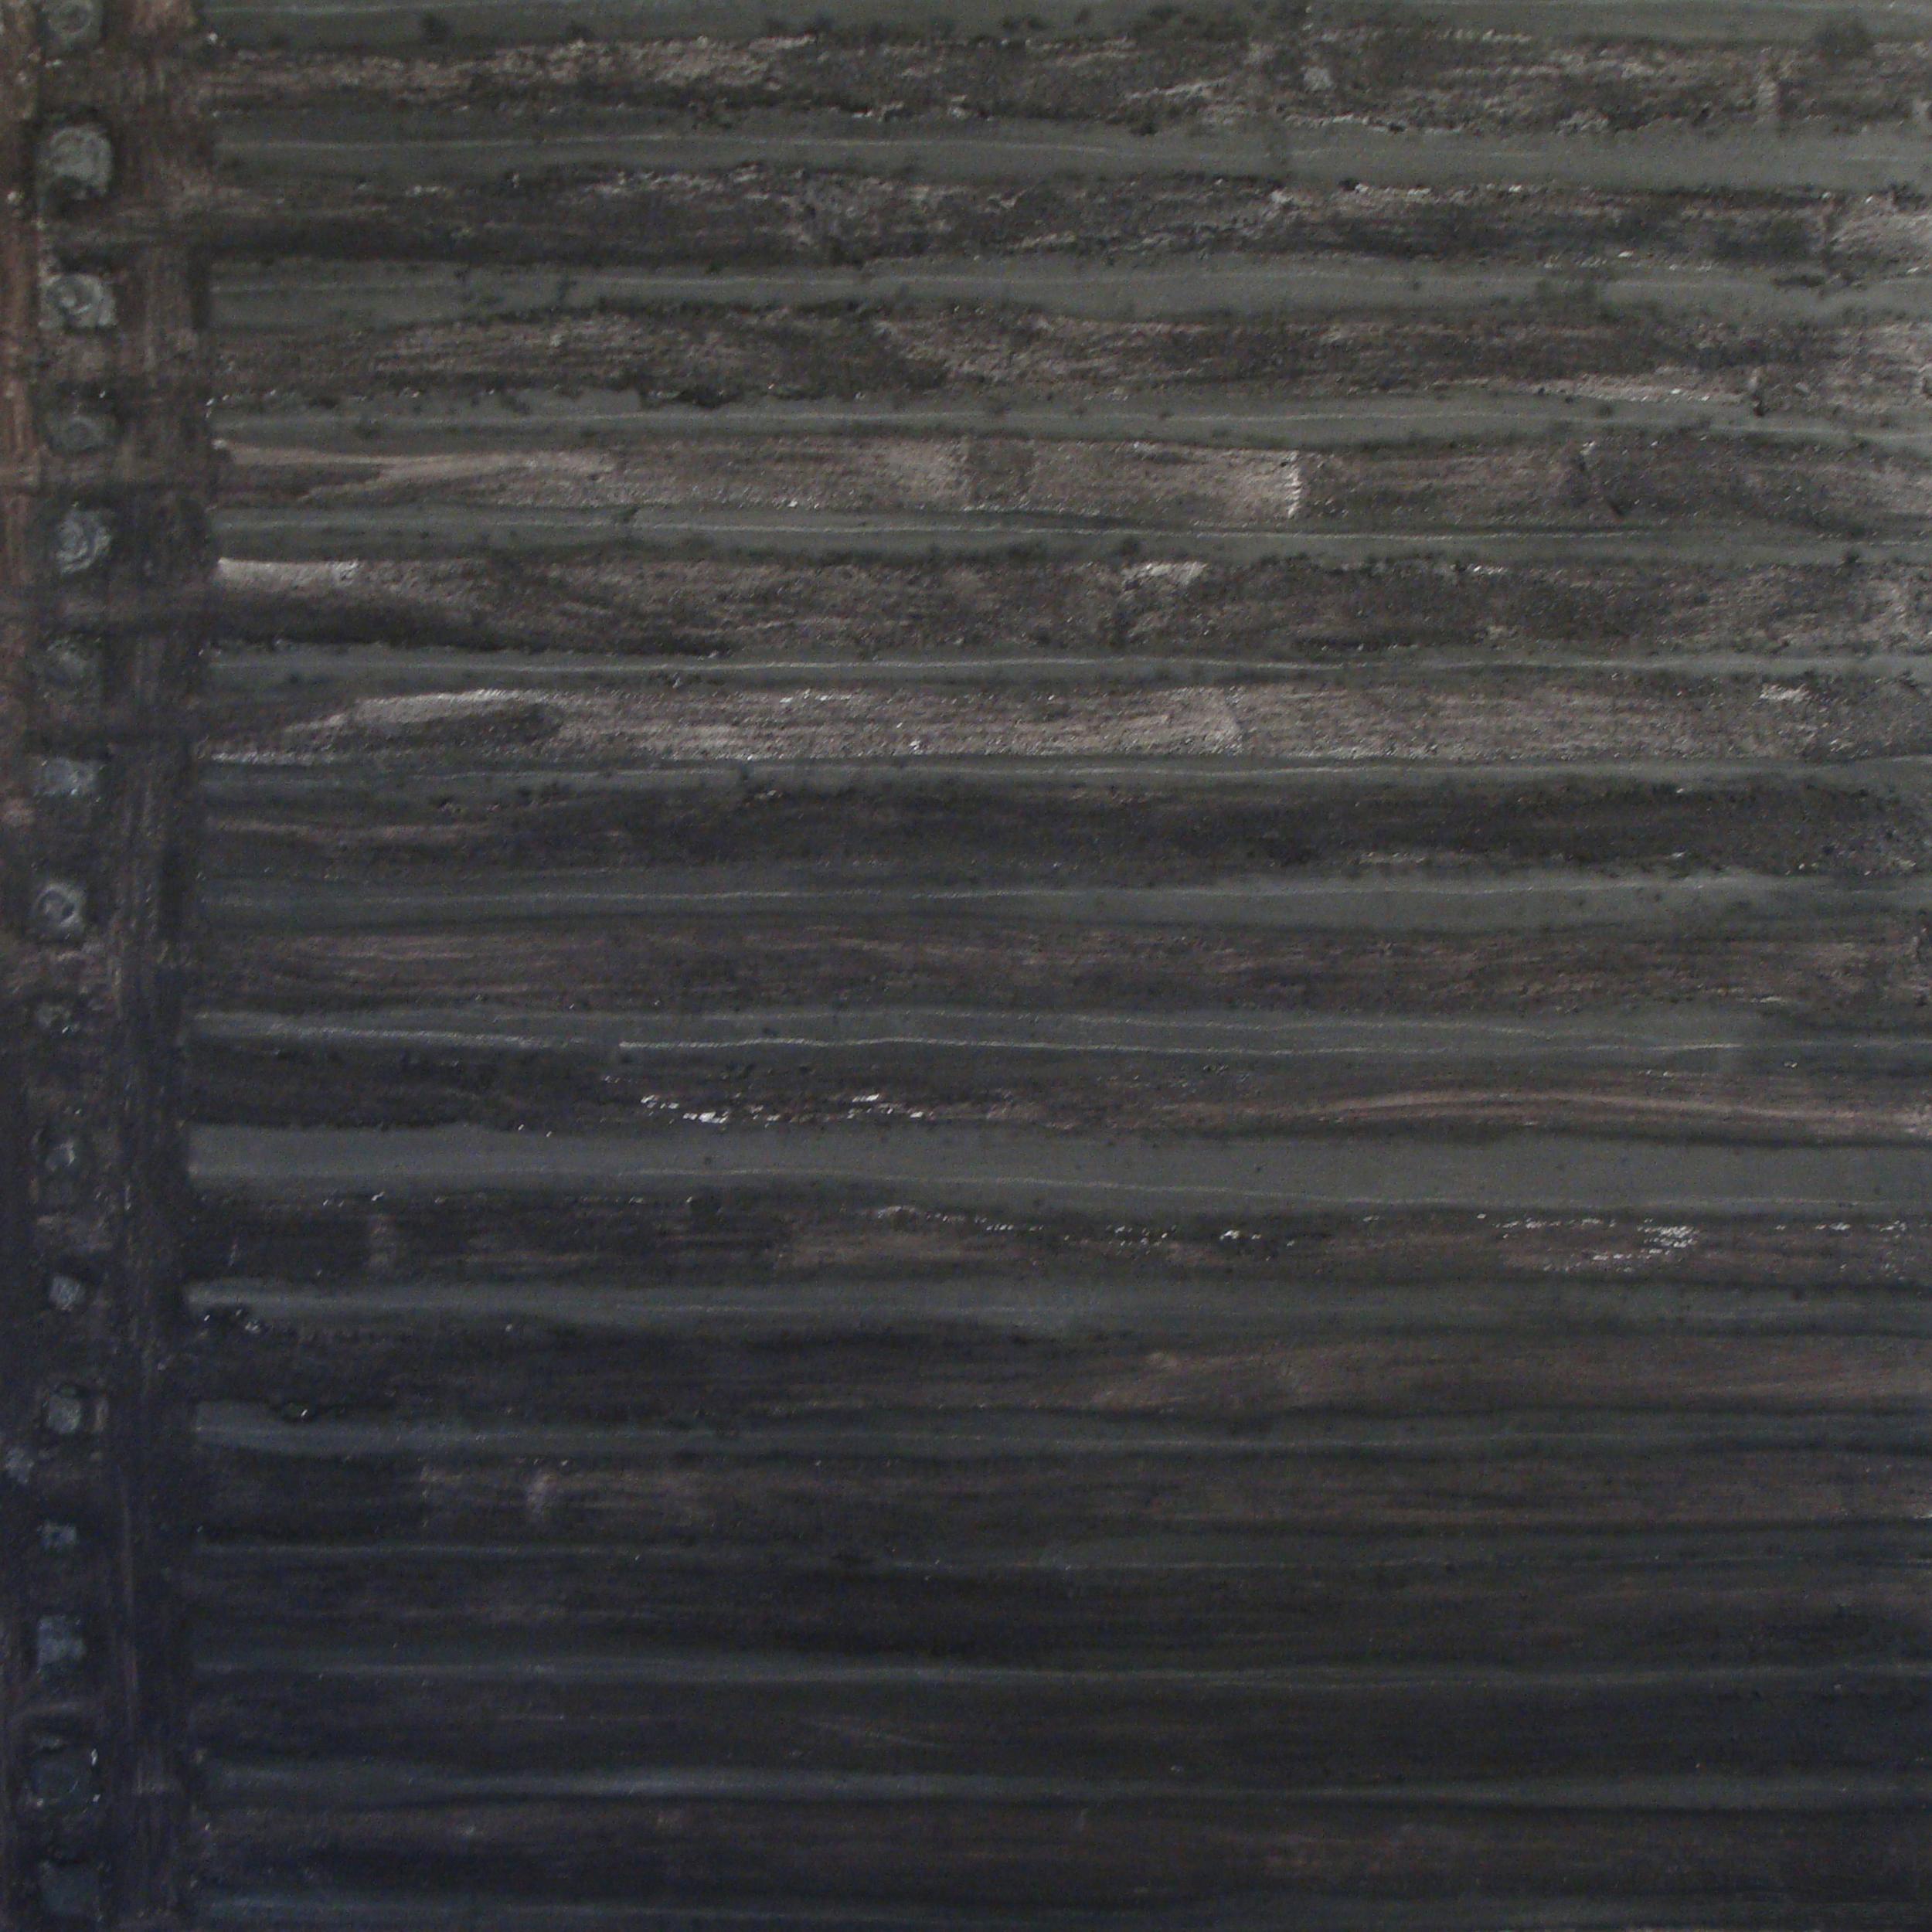 08_Zvok zapis slika (mesana tehnika 125 x 125 cm)_Breda Sturm.jpg